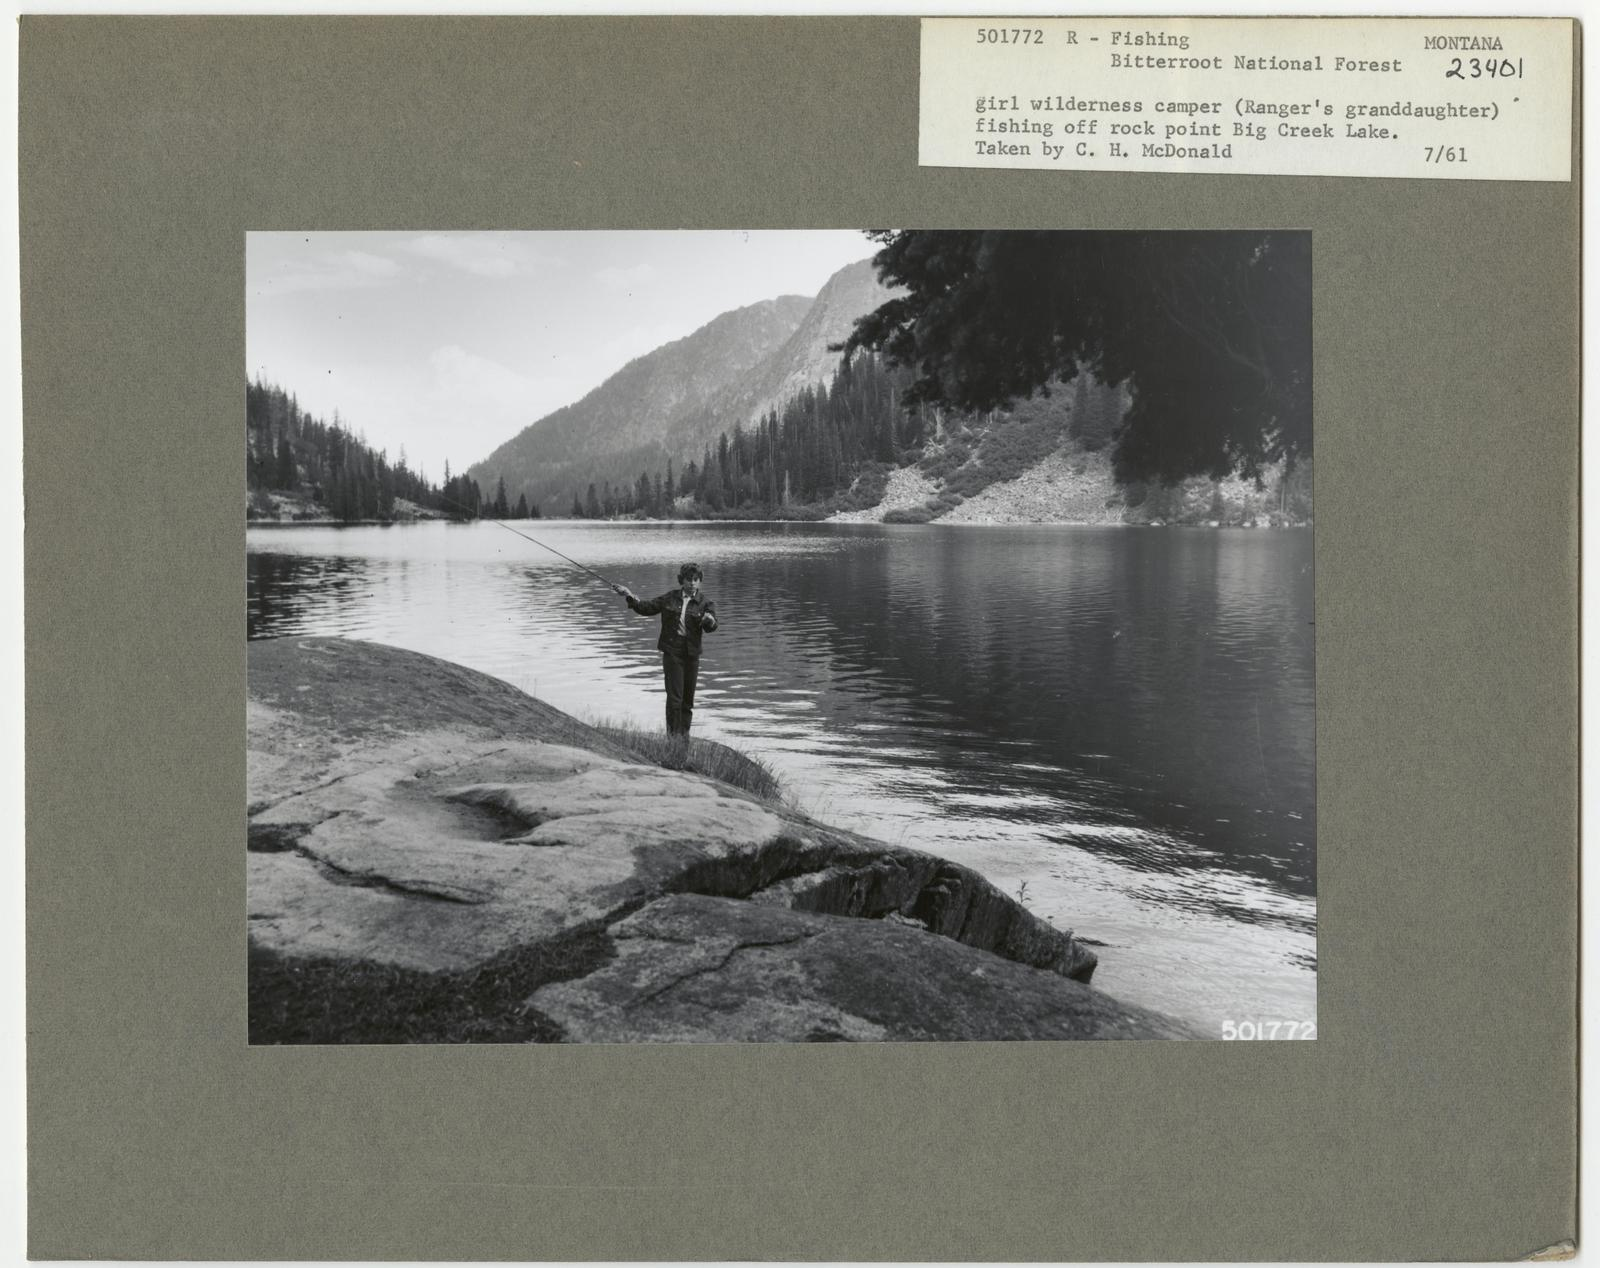 Fishing - Montana